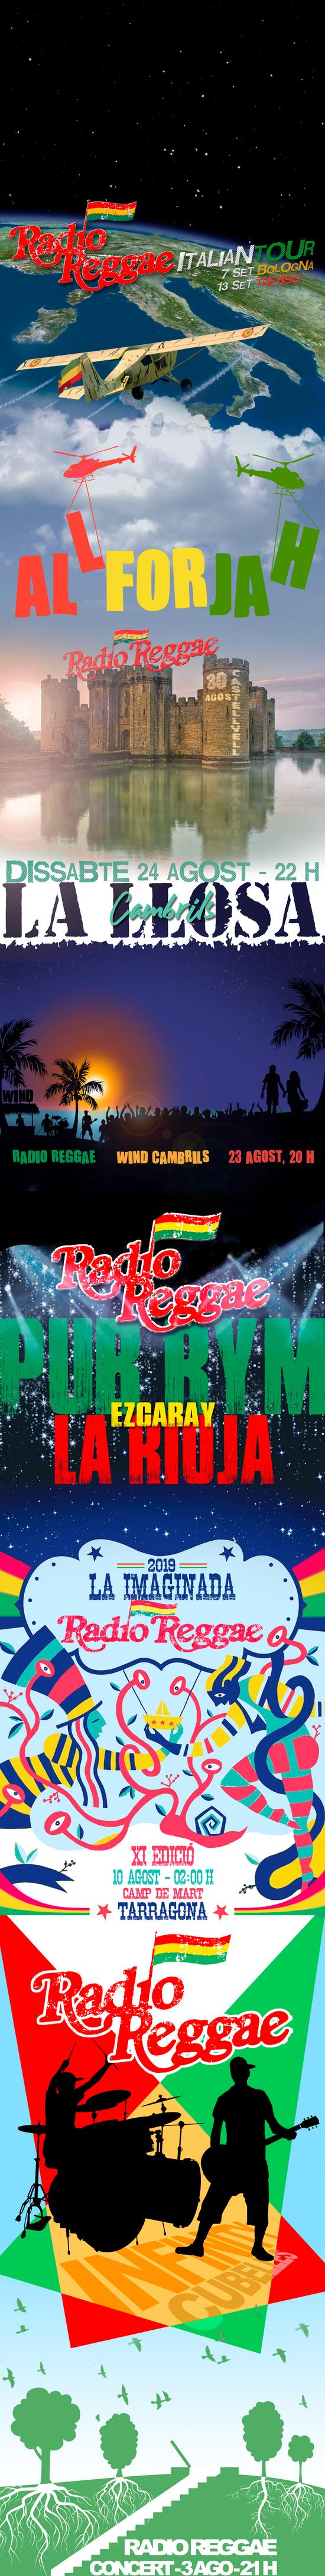 RADIO REGGAE - DISSENY INSTAGRAM PAGE